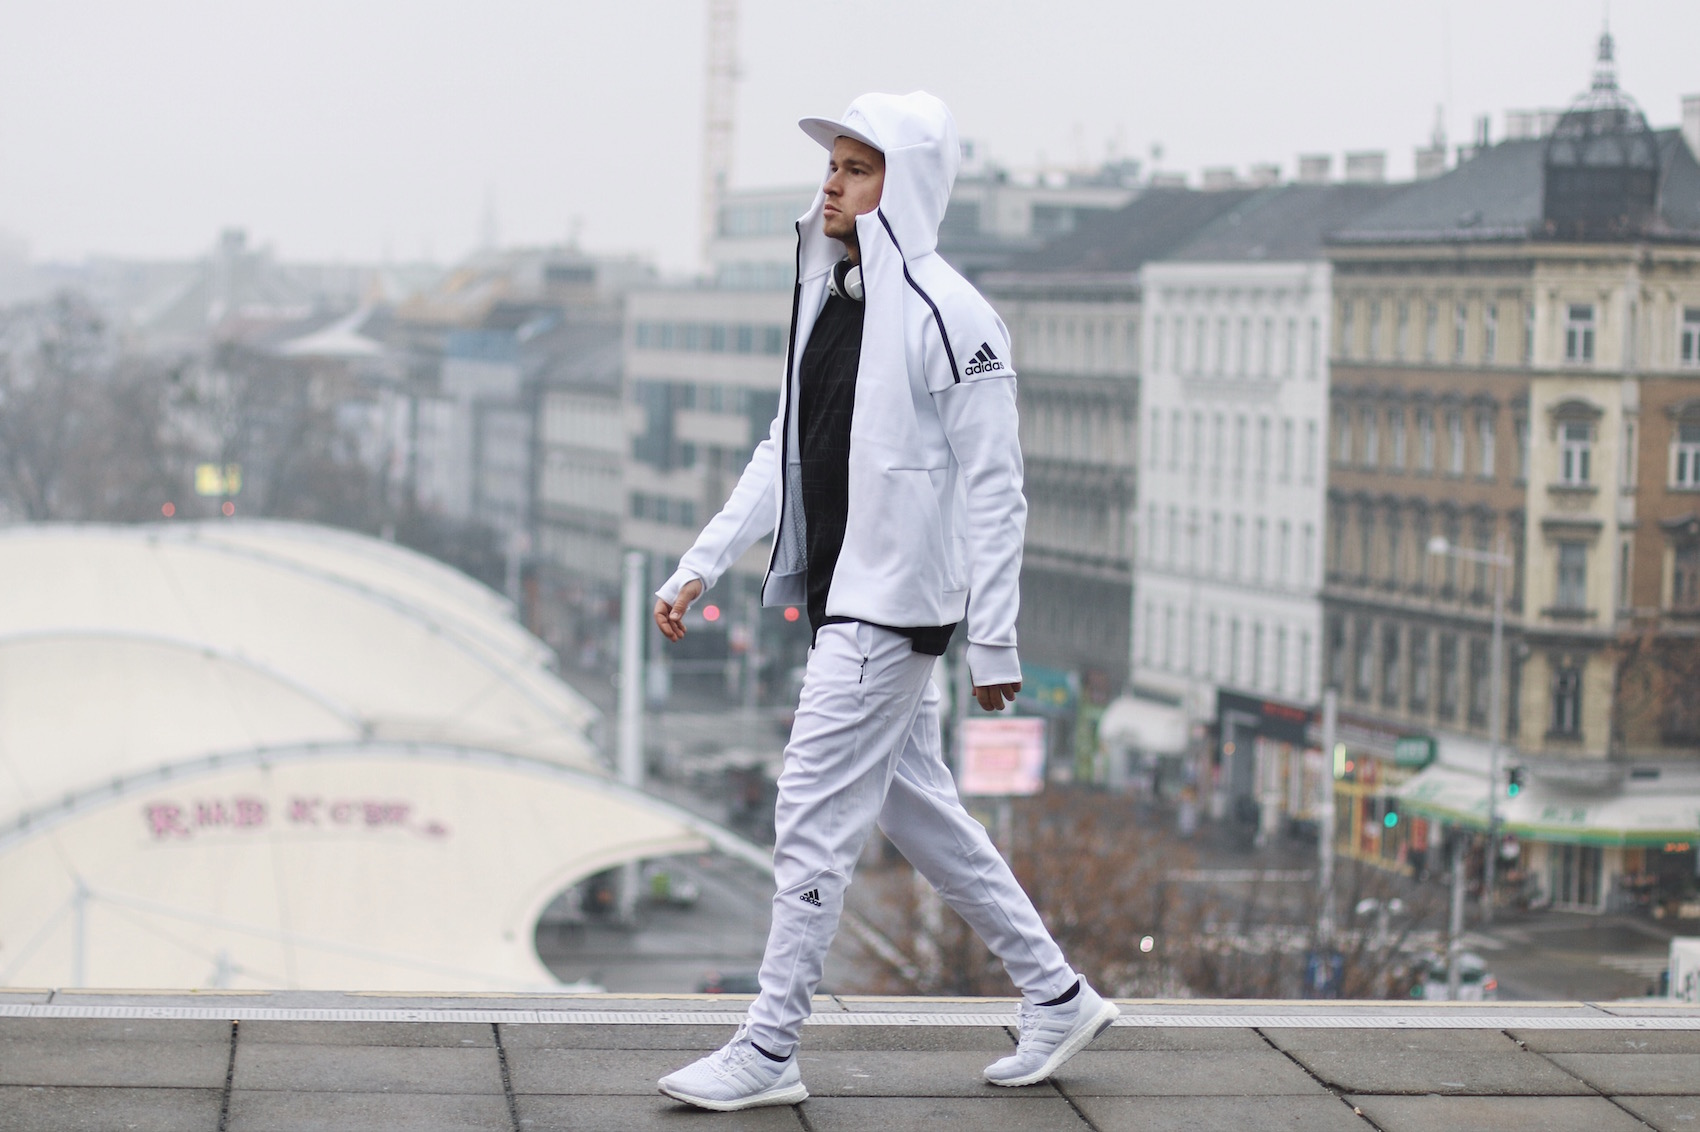 Adidas ZNE Hoodie_Adidas Austria_Meanwhile in Awesometown_Wiener Männerblog Modeblog Männermode Lifestyleblog4